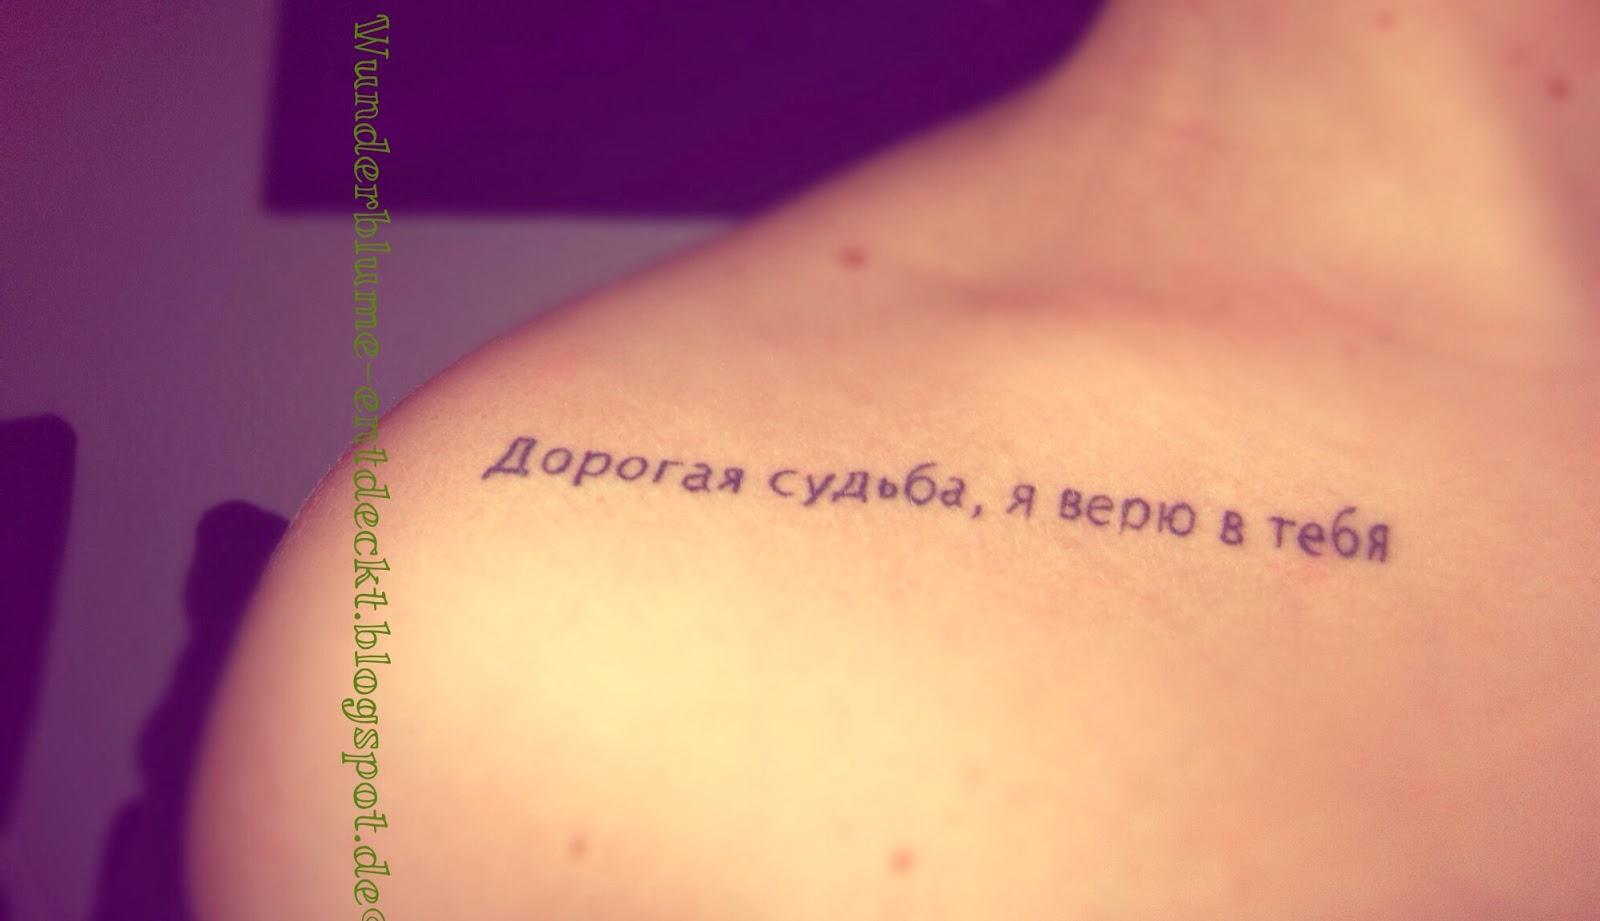 tatoo schriftzge cheap schrift tattoo hand with tatoo. Black Bedroom Furniture Sets. Home Design Ideas